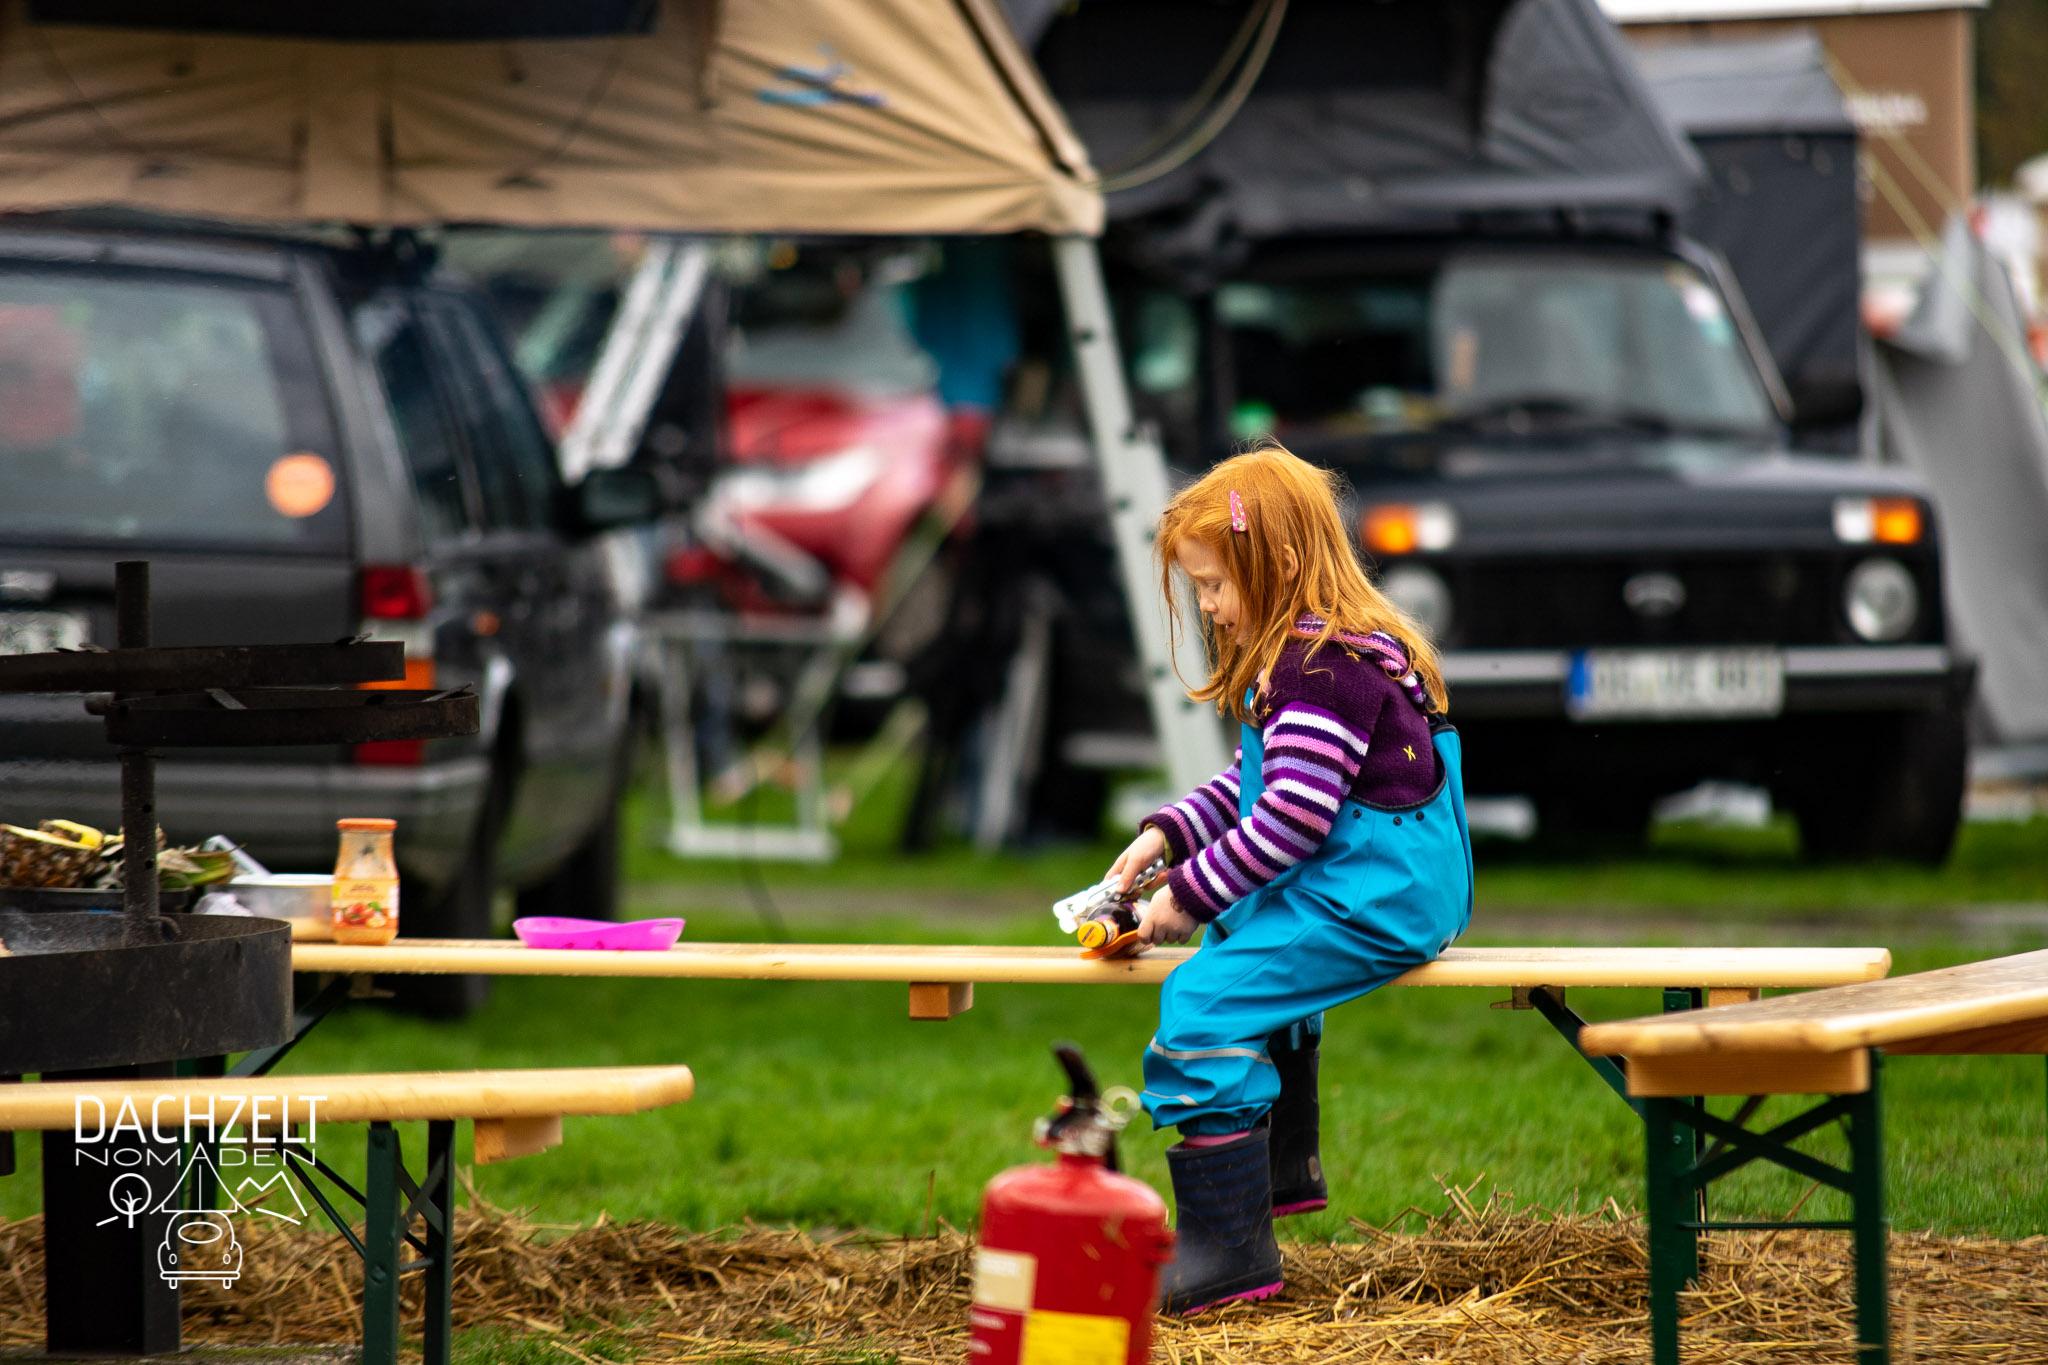 20191018-Dachzelt-Camp-Speciaal-Diana-Schandwinkel-DSC08350